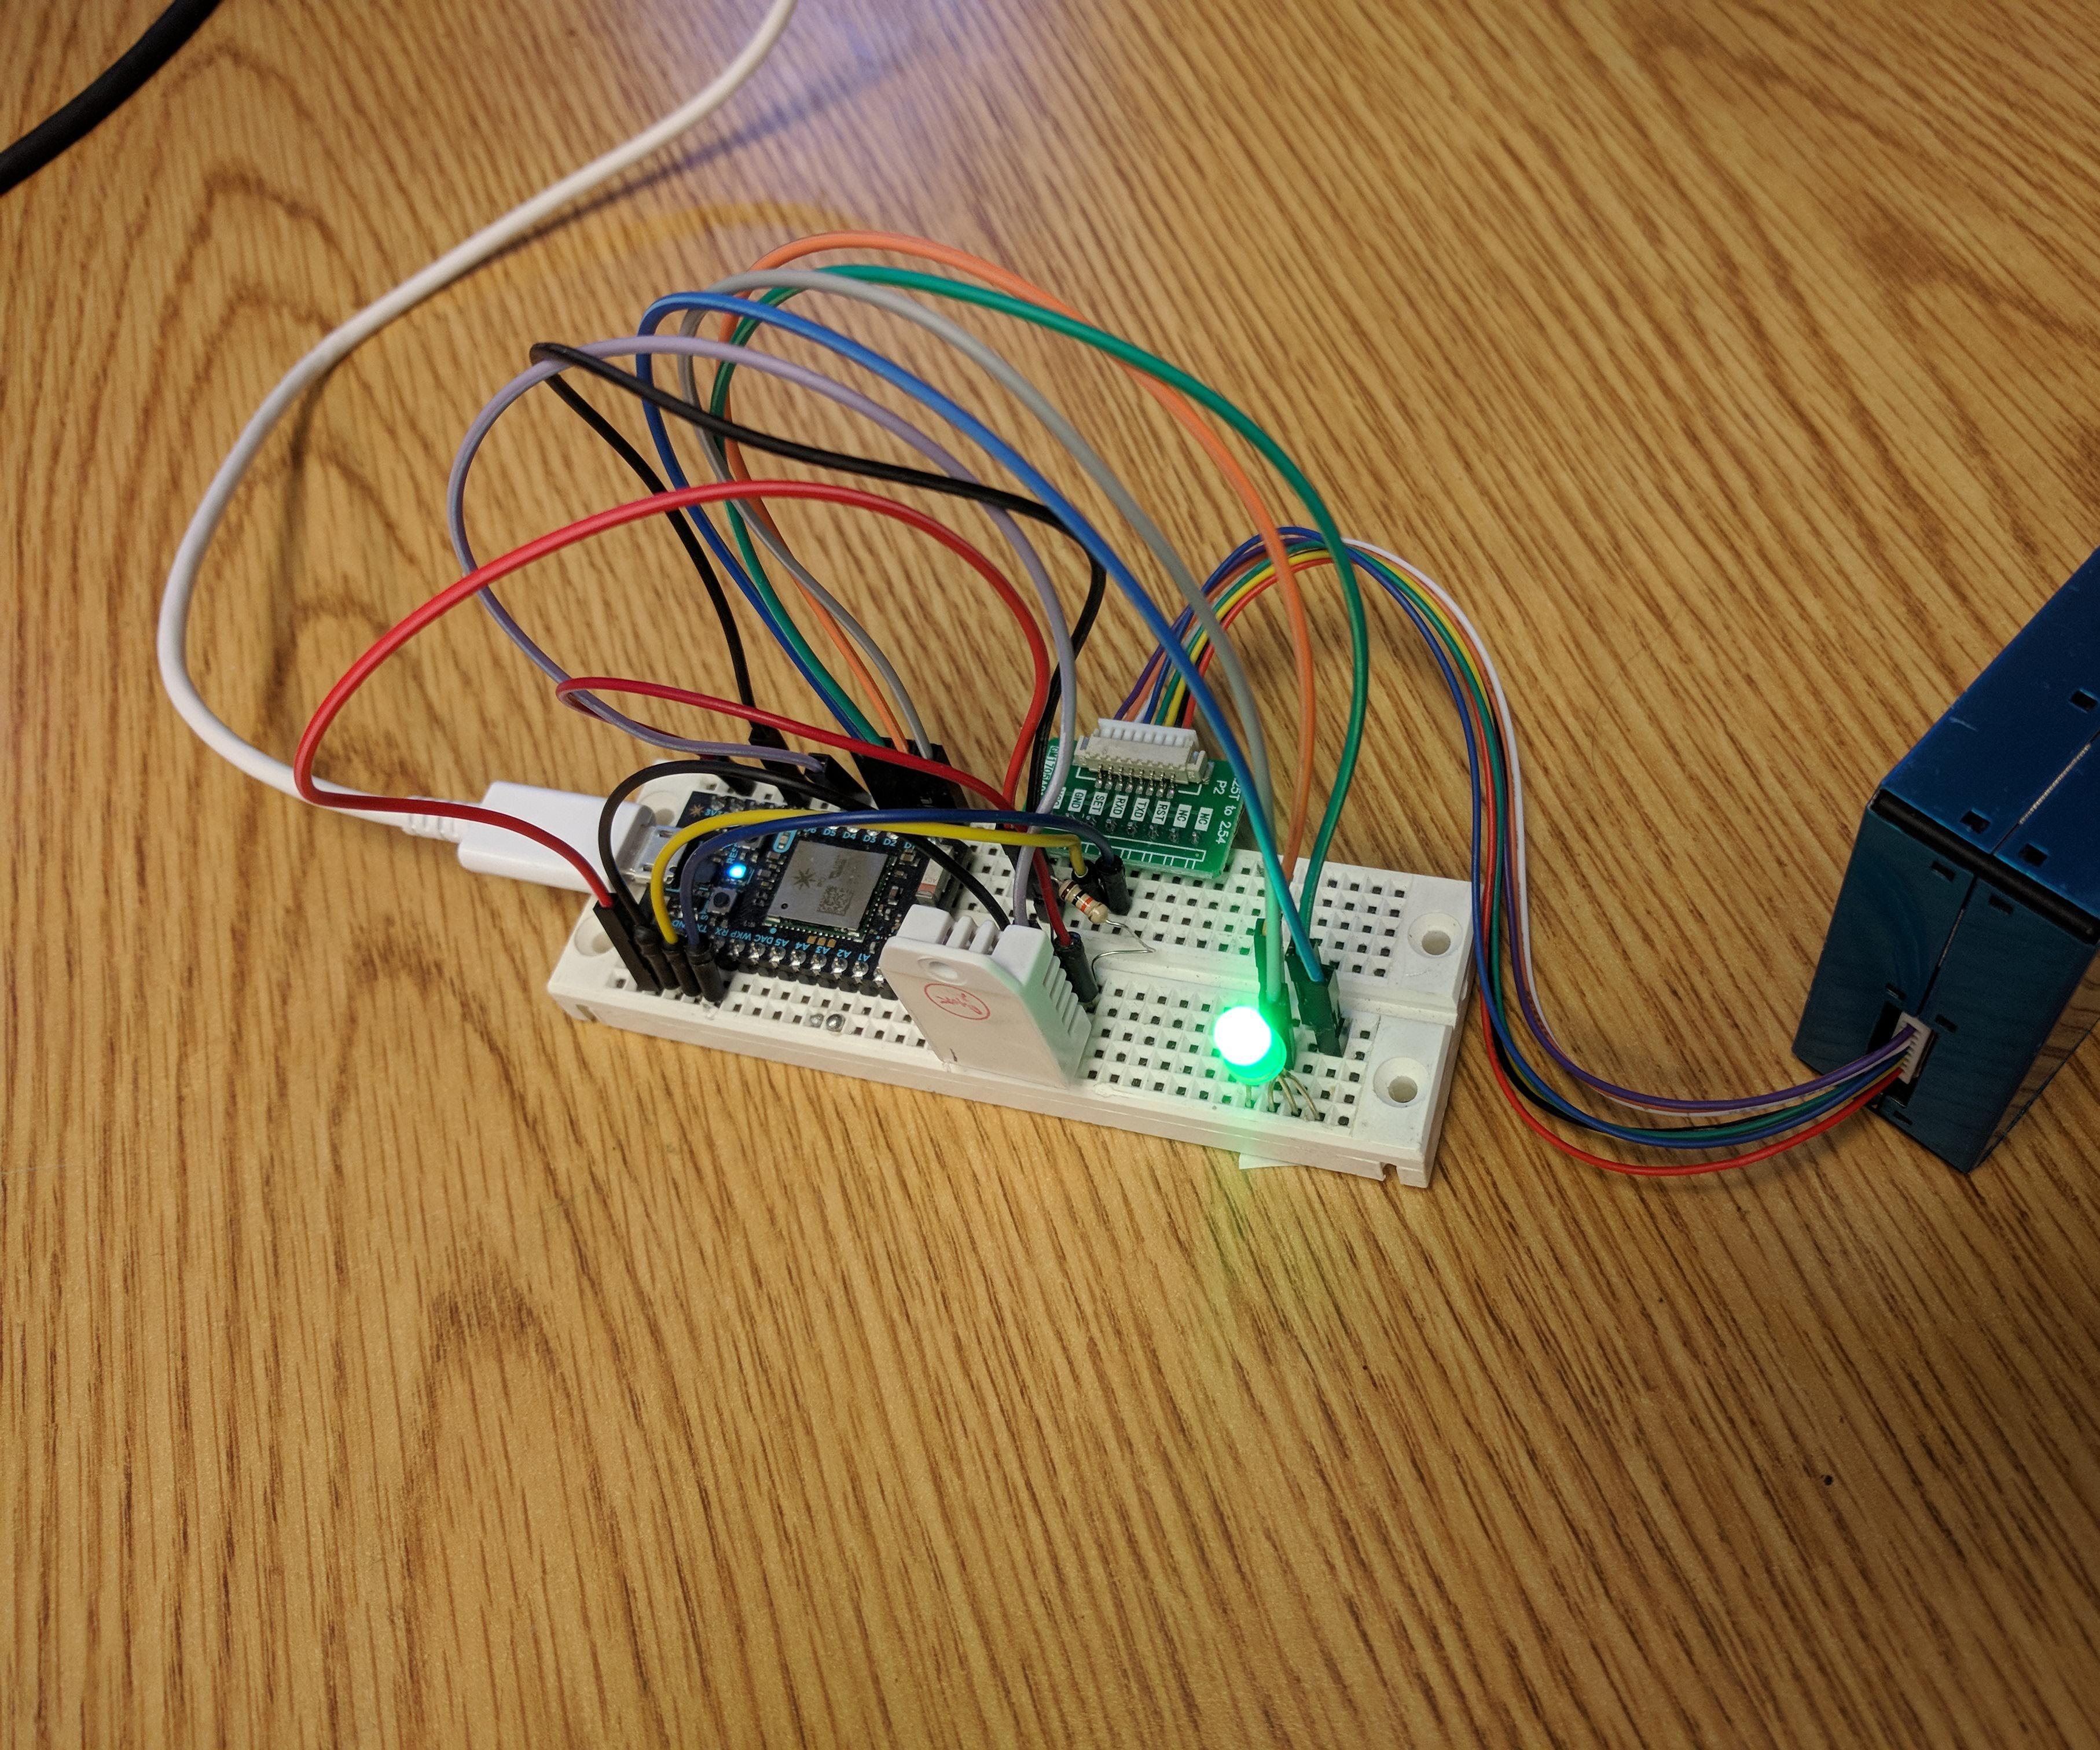 Photon Air Sensor - Monitor PM Levels